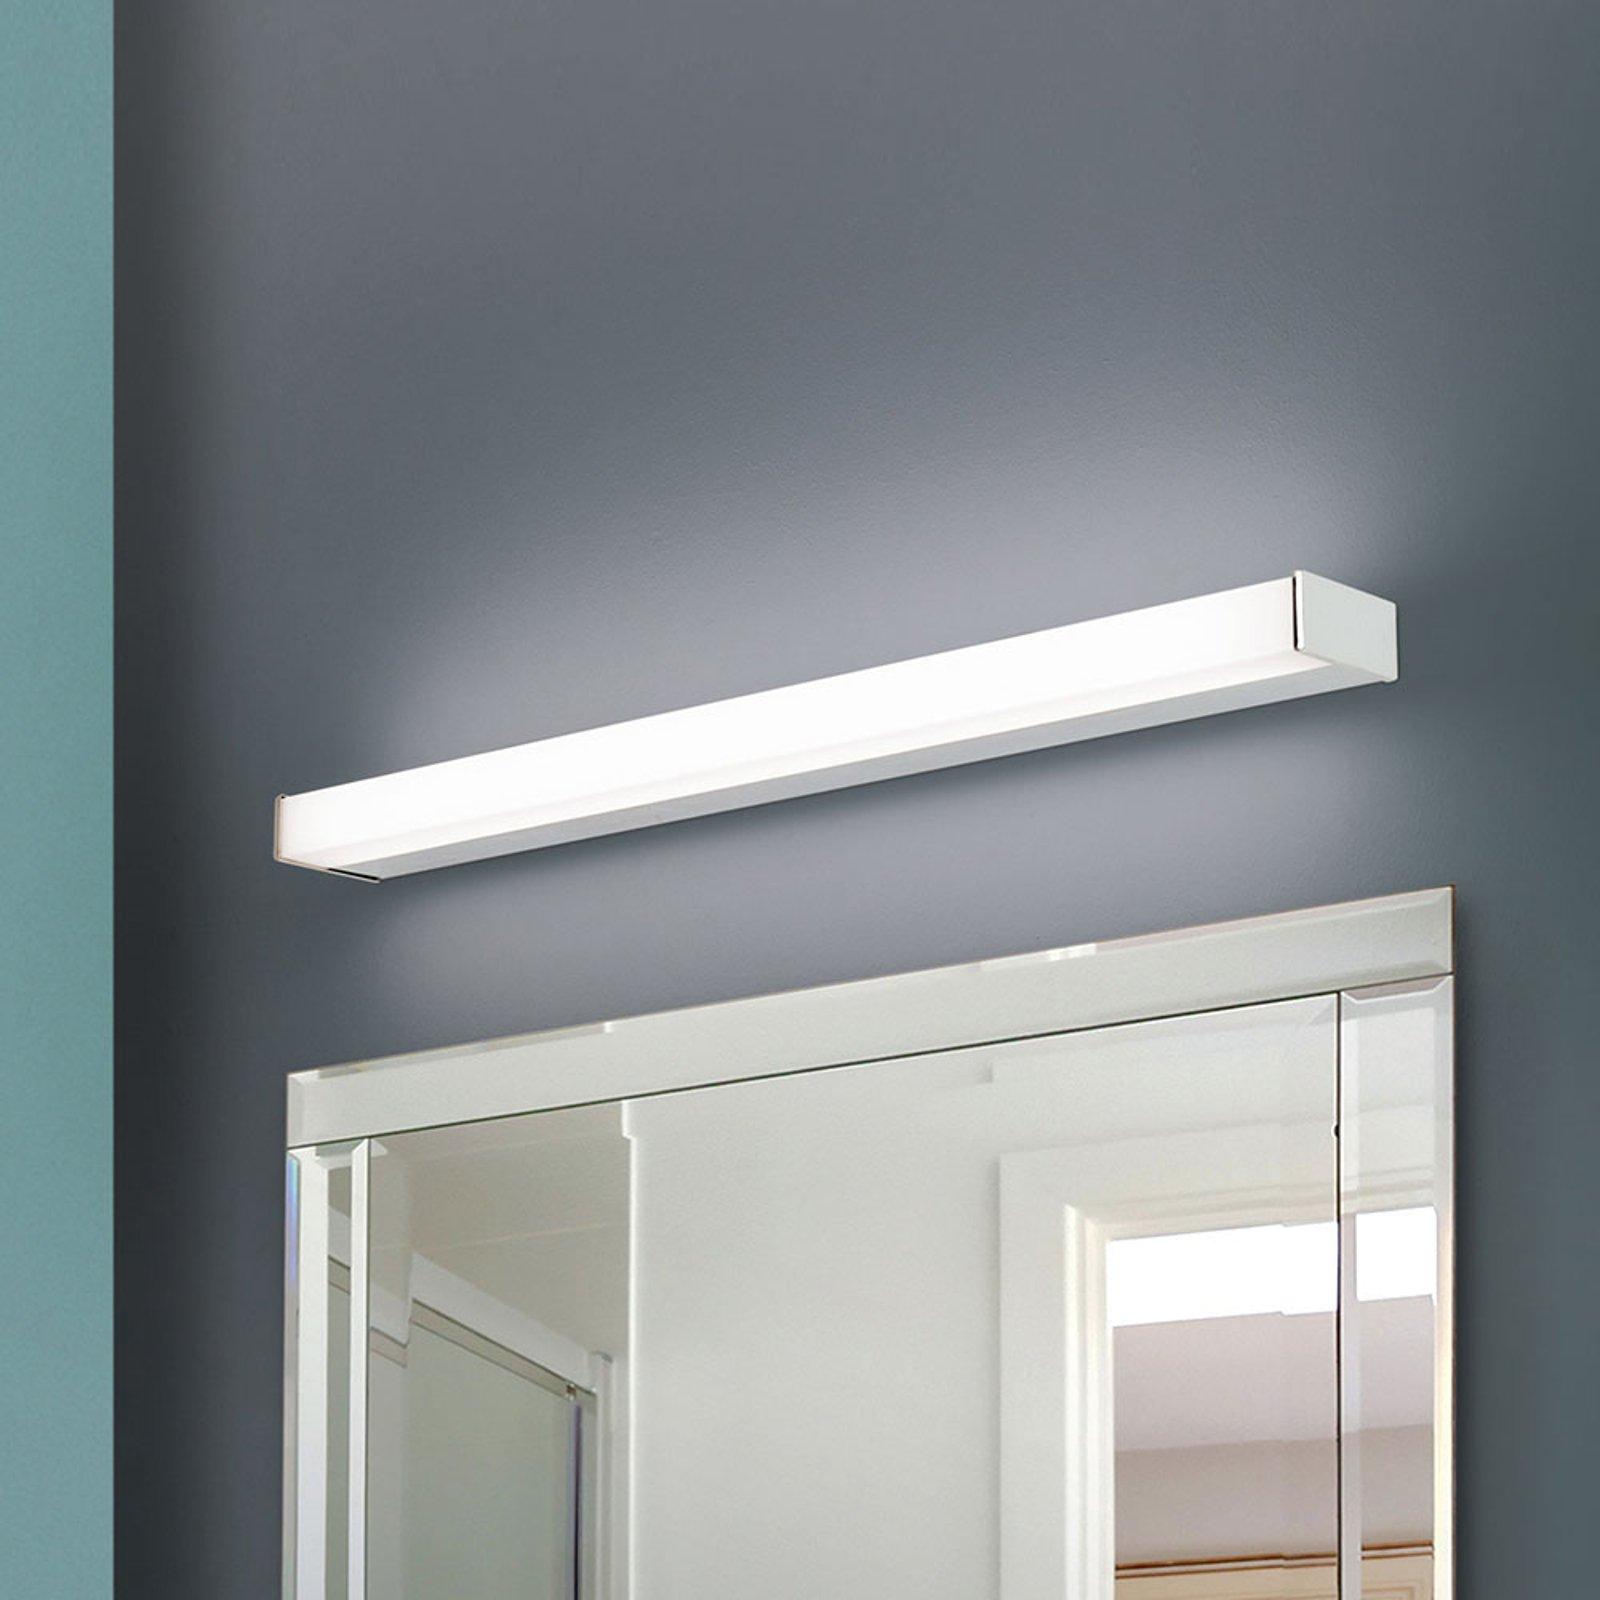 LED-speillampe Marilyn 70 cm krom